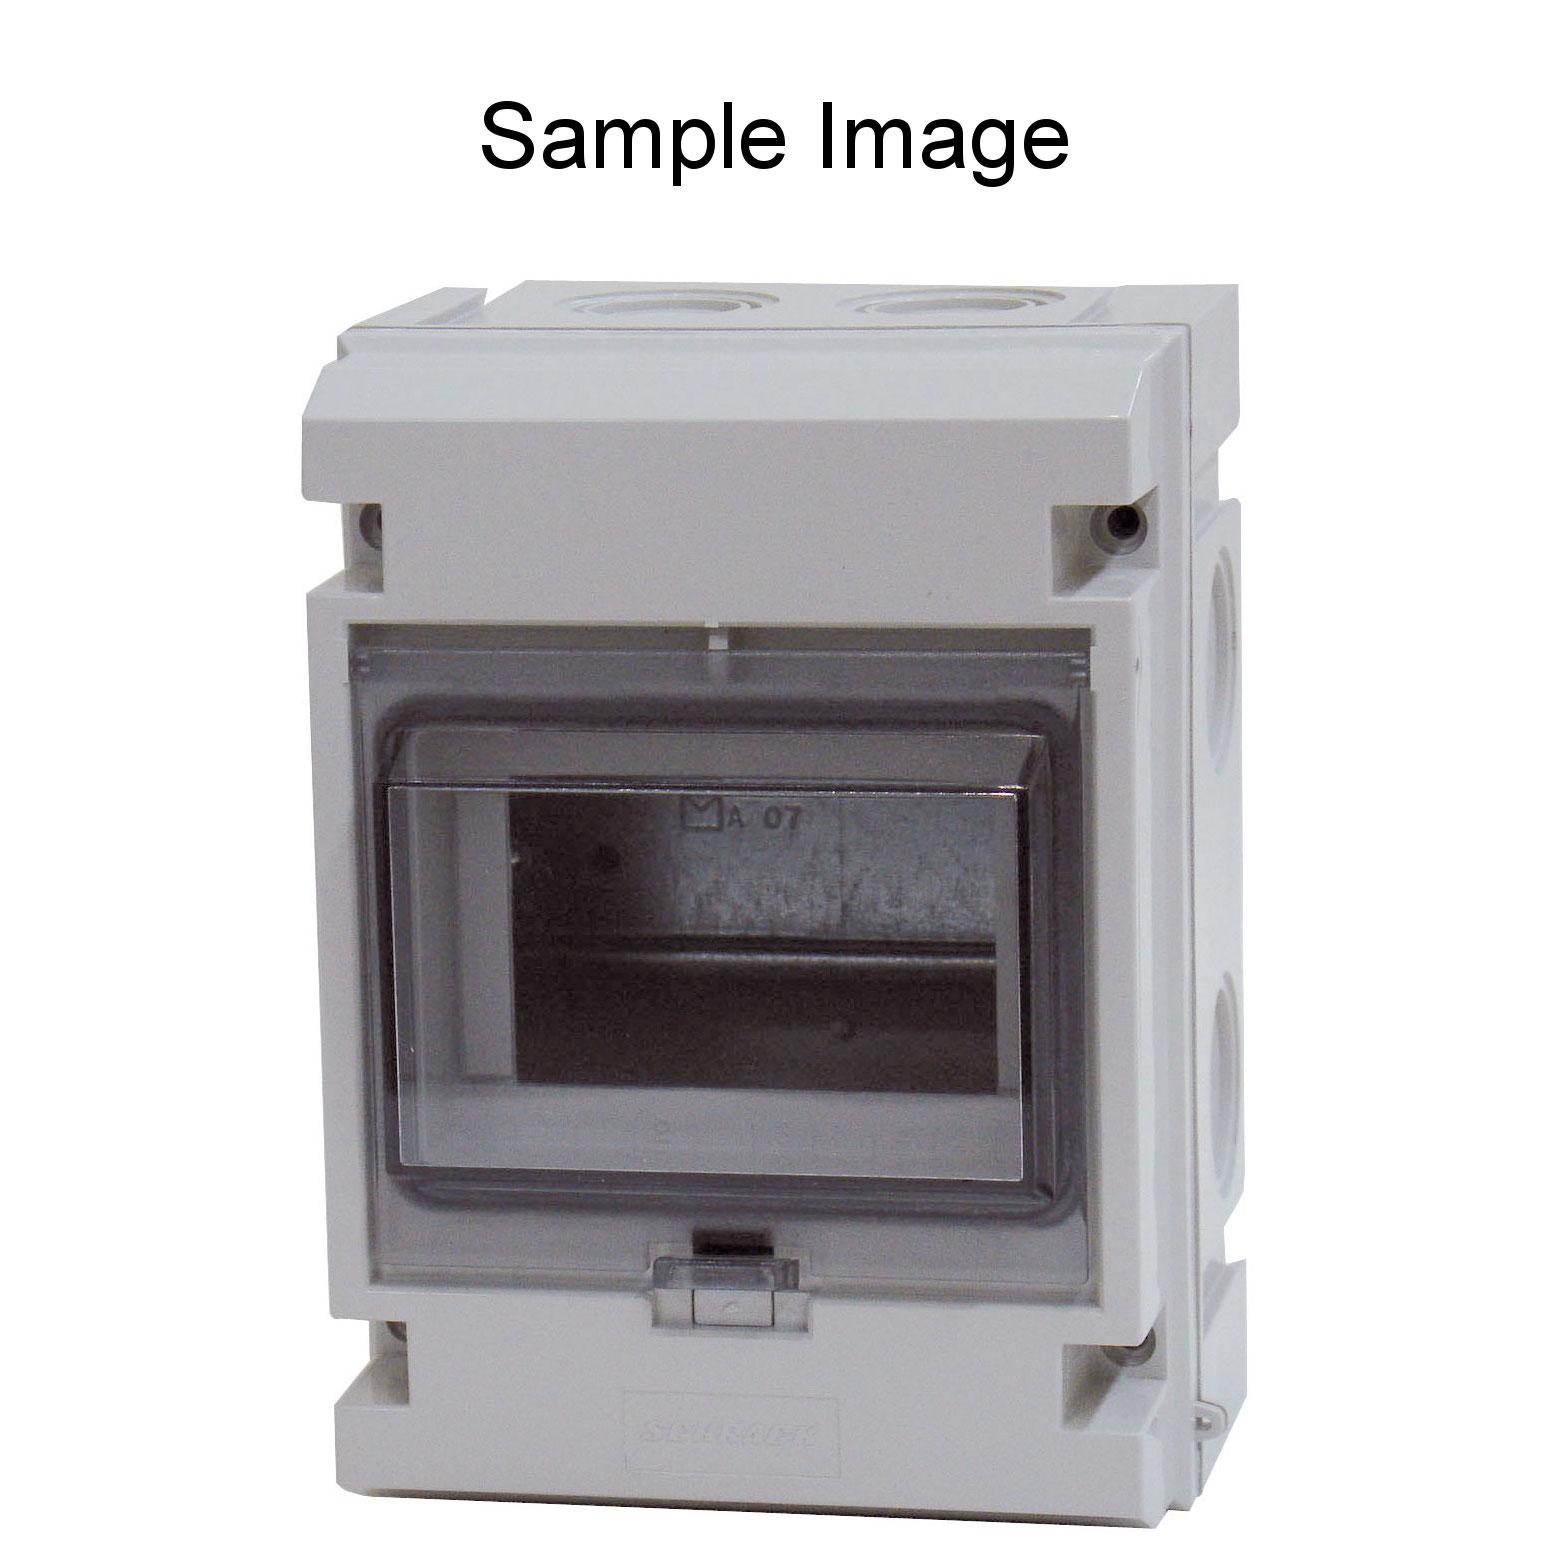 1 Stk Automatengehäuse, 12TE, 1-reihig mit Klappdeckel, IP55 IM009022--